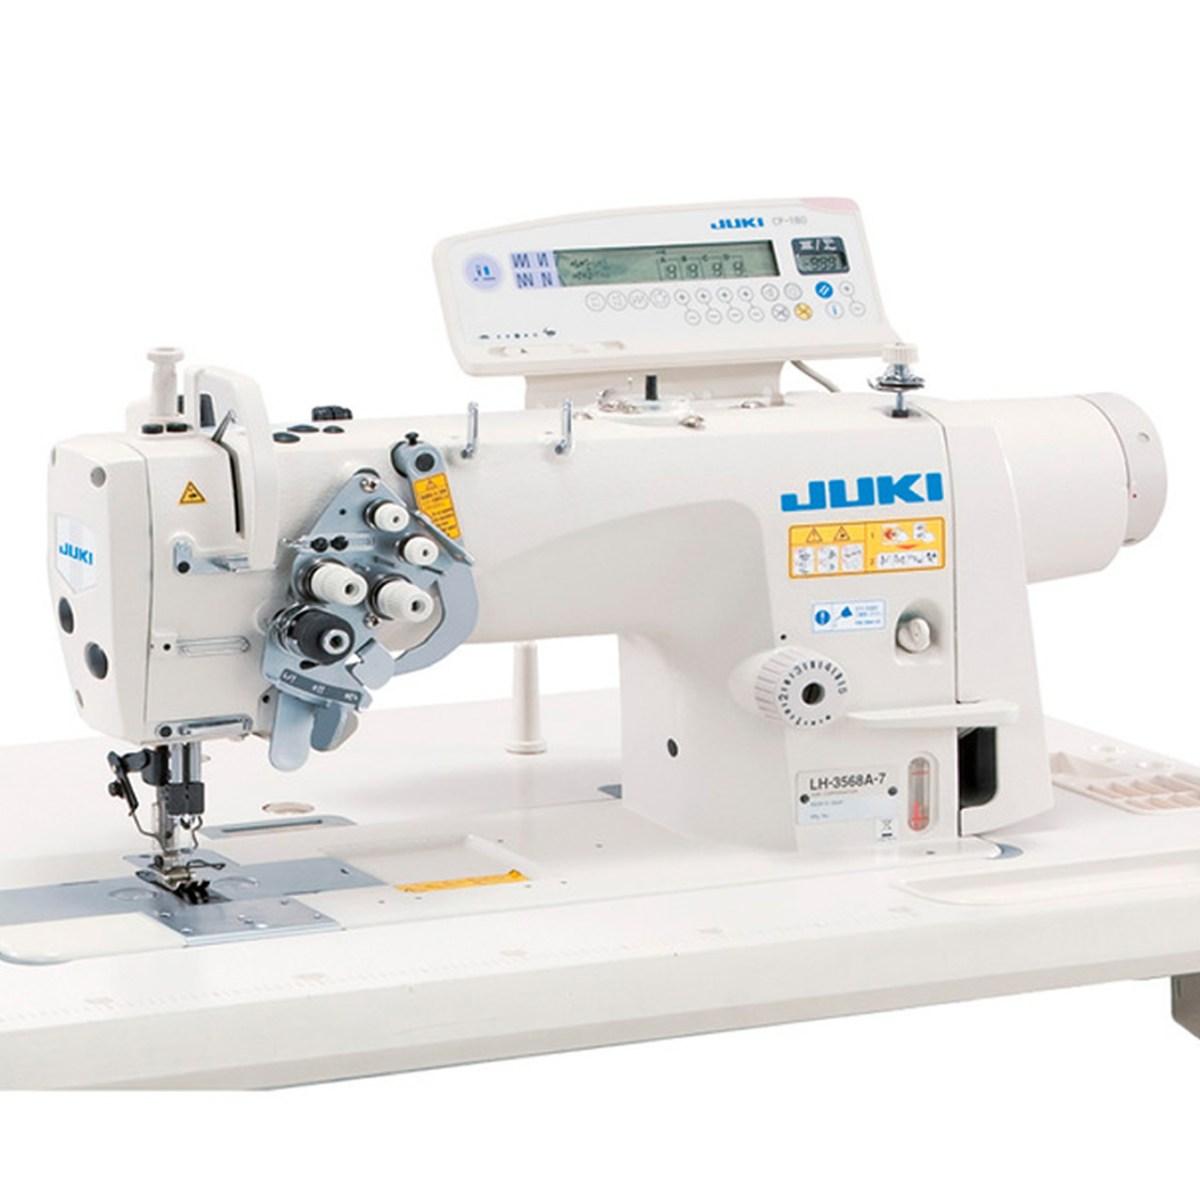 JUKI LH-3568A-7 – Find Sewing Machine